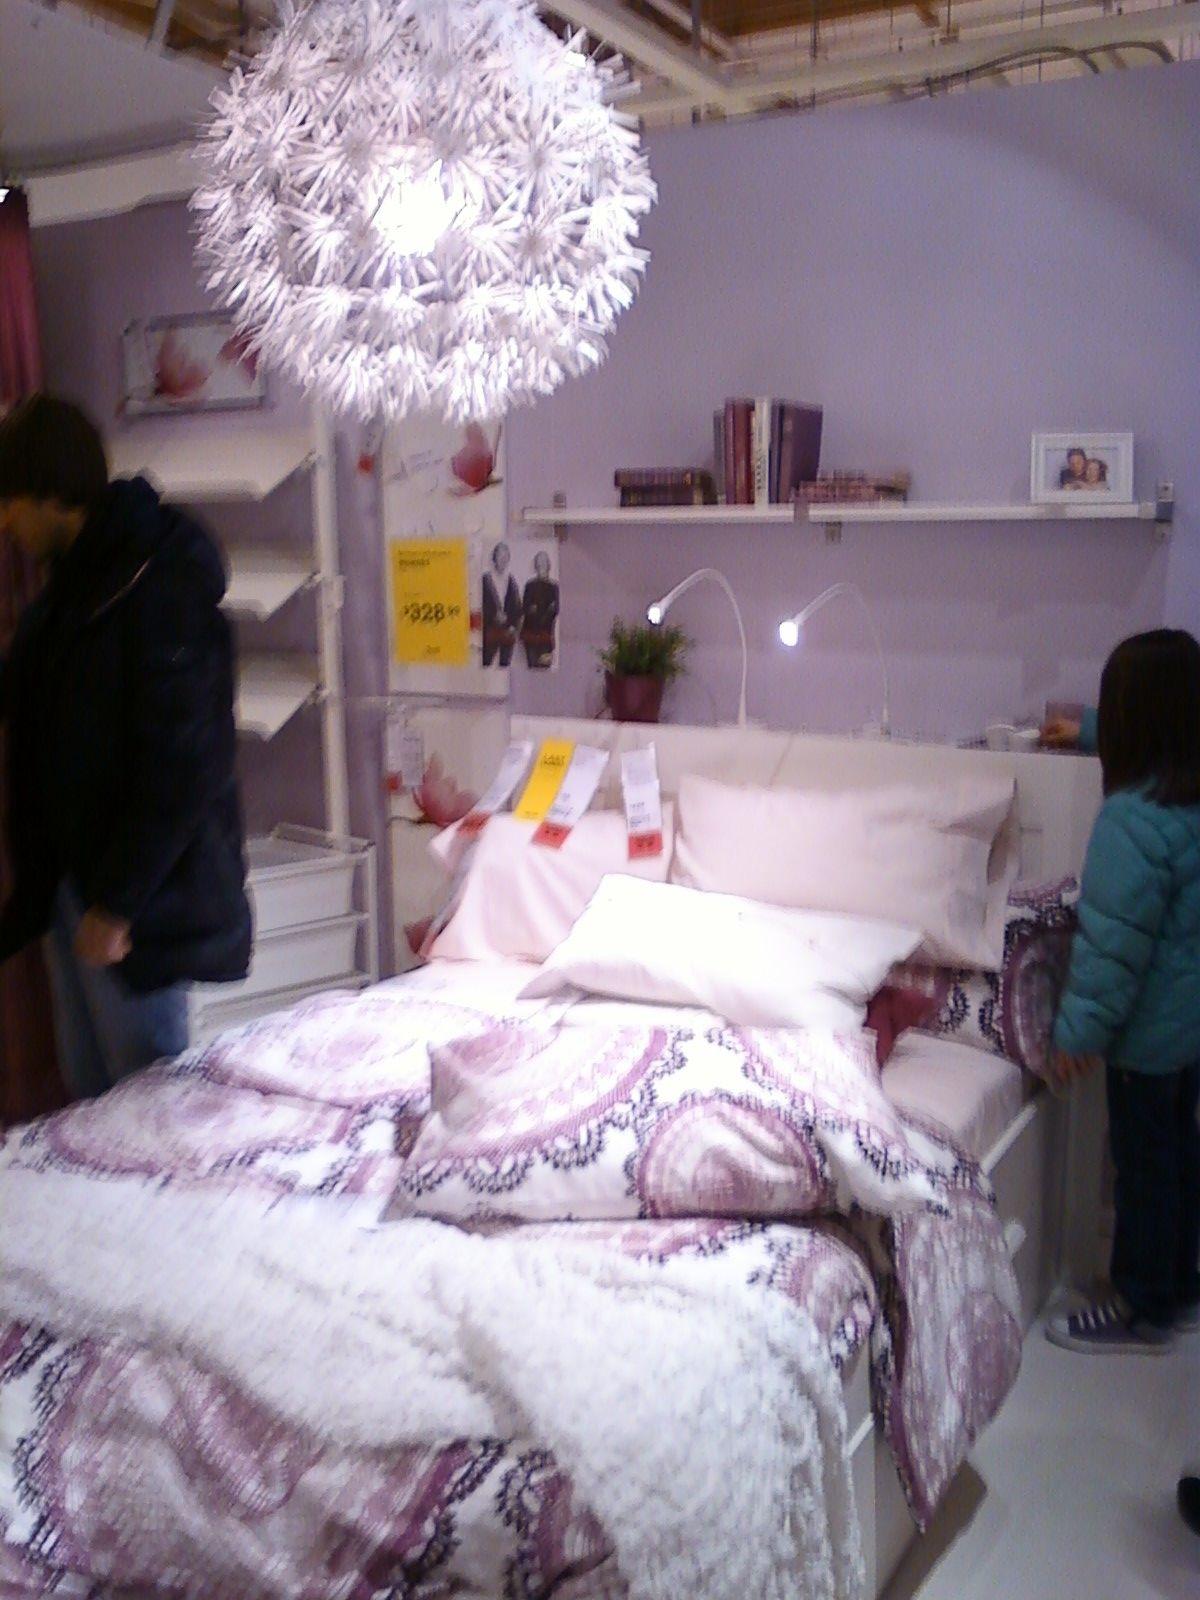 ikea bedroom display seattle, wa